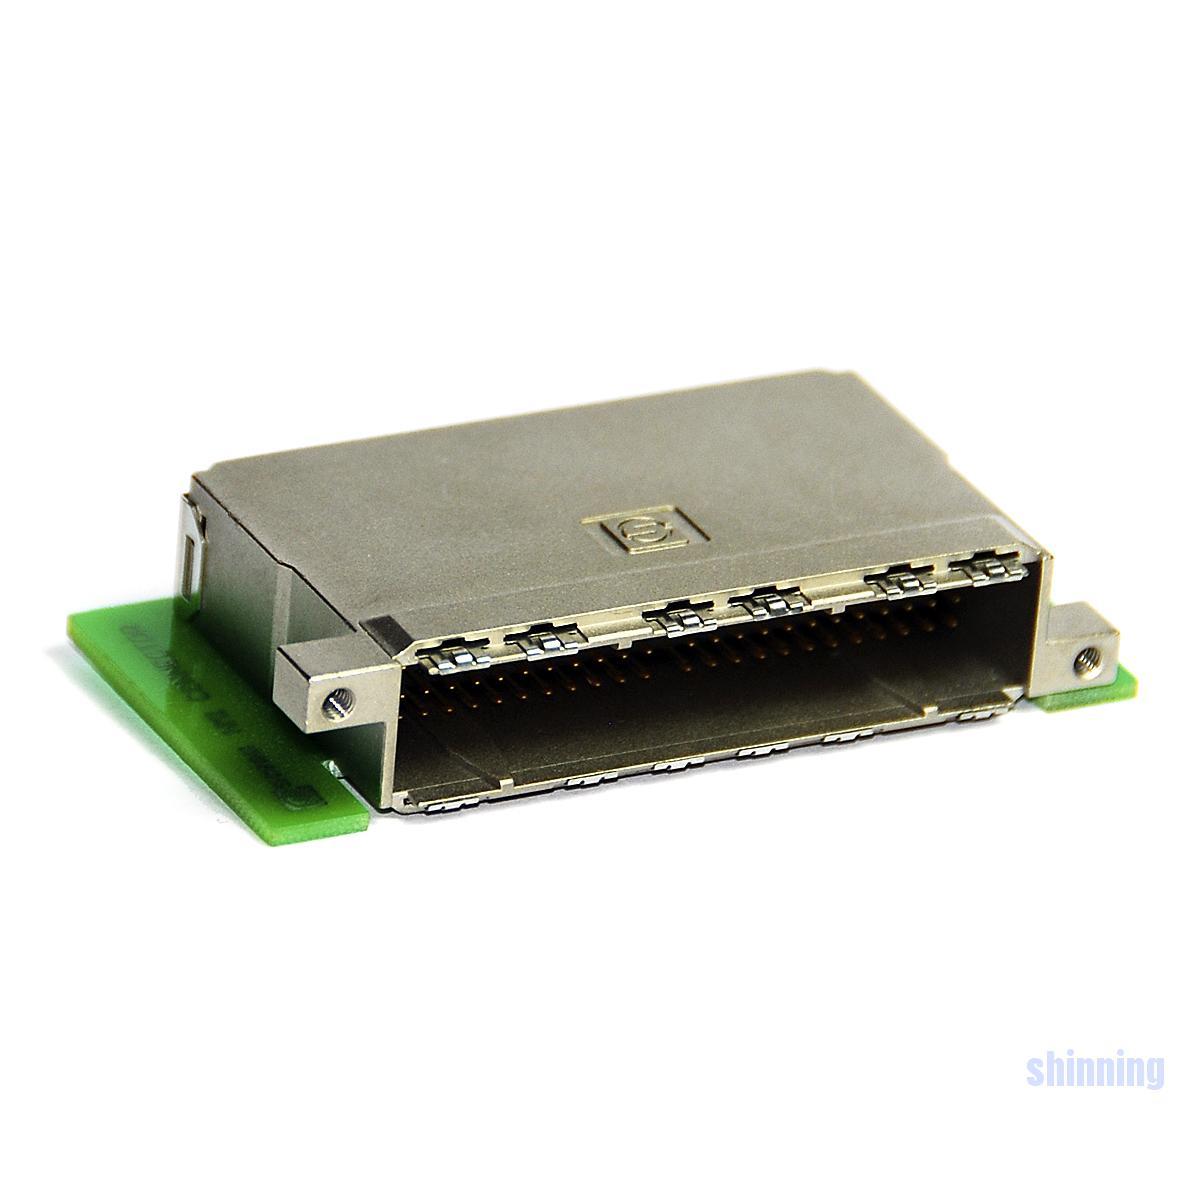 1809 4x24 板端弯公连接器 带ESD弹片